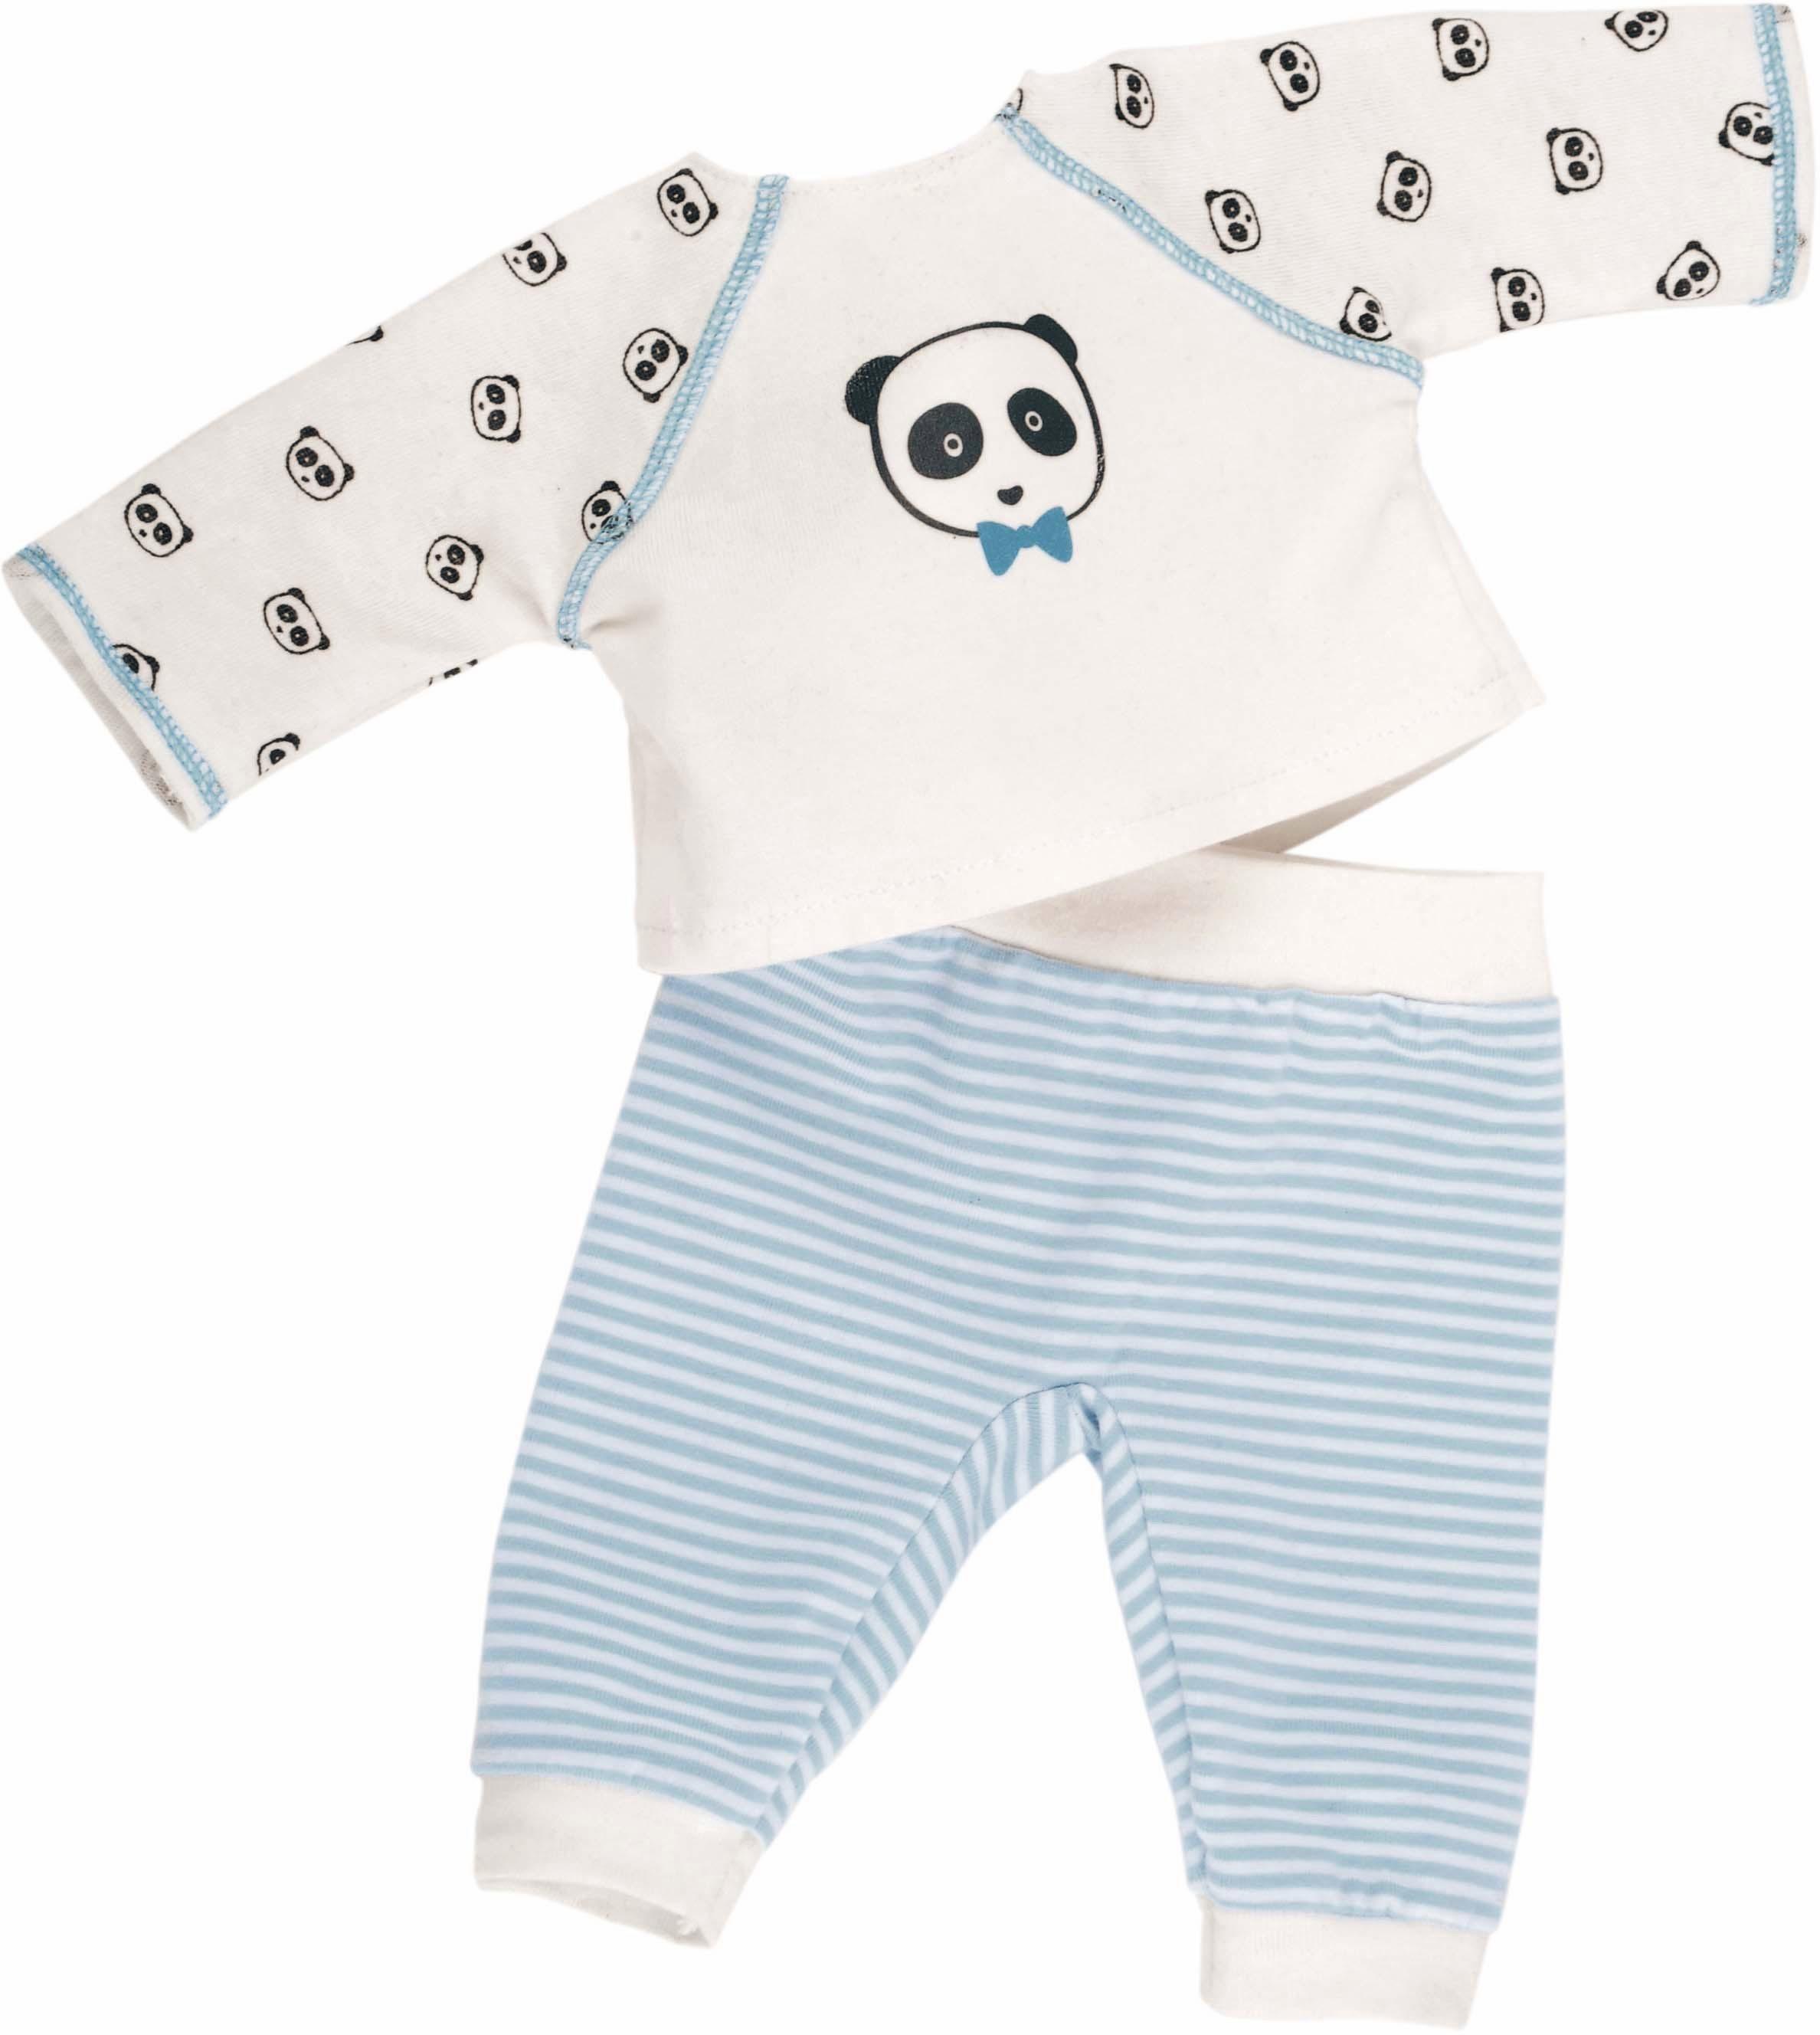 Käthe Kruse Puppenbekleidung, Größe ca. 35-37 cm, »Panda Schlafanzug«